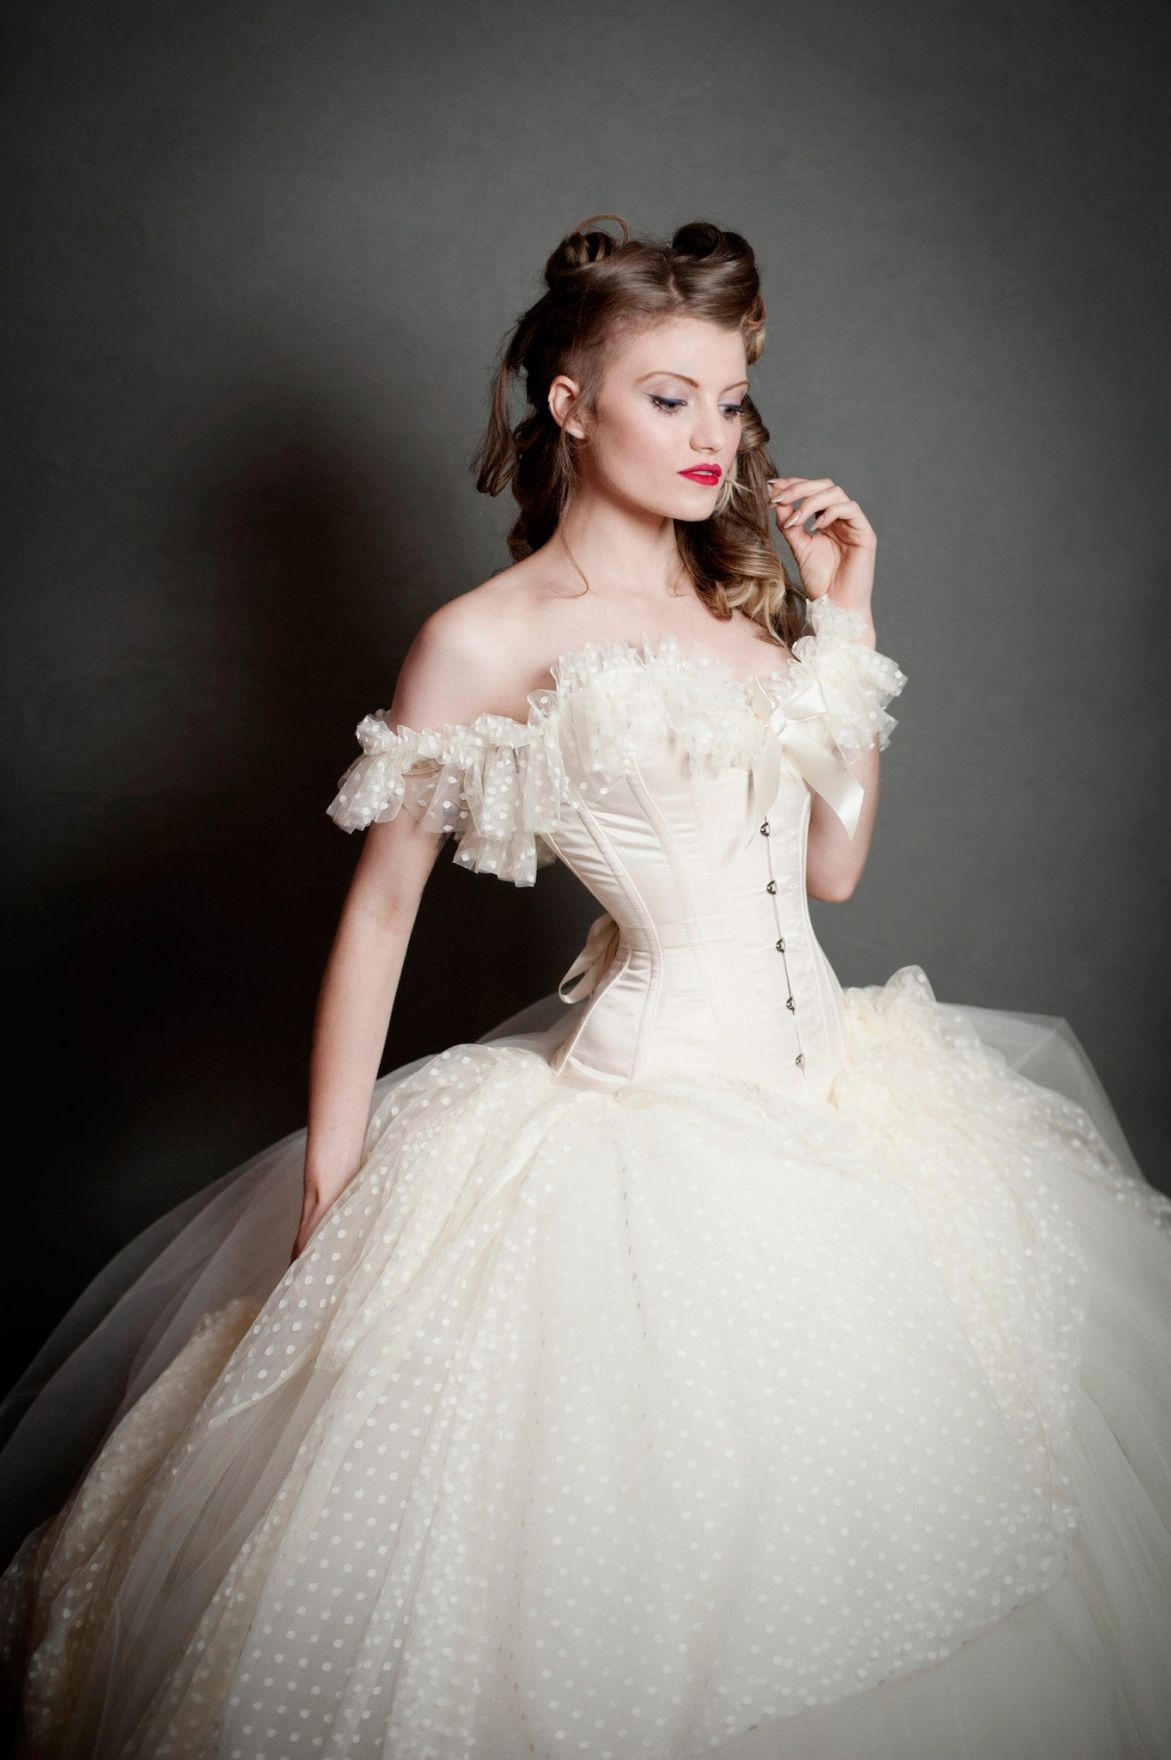 100+ Steel Boned Corset Wedding Dress Plus Size Dresses